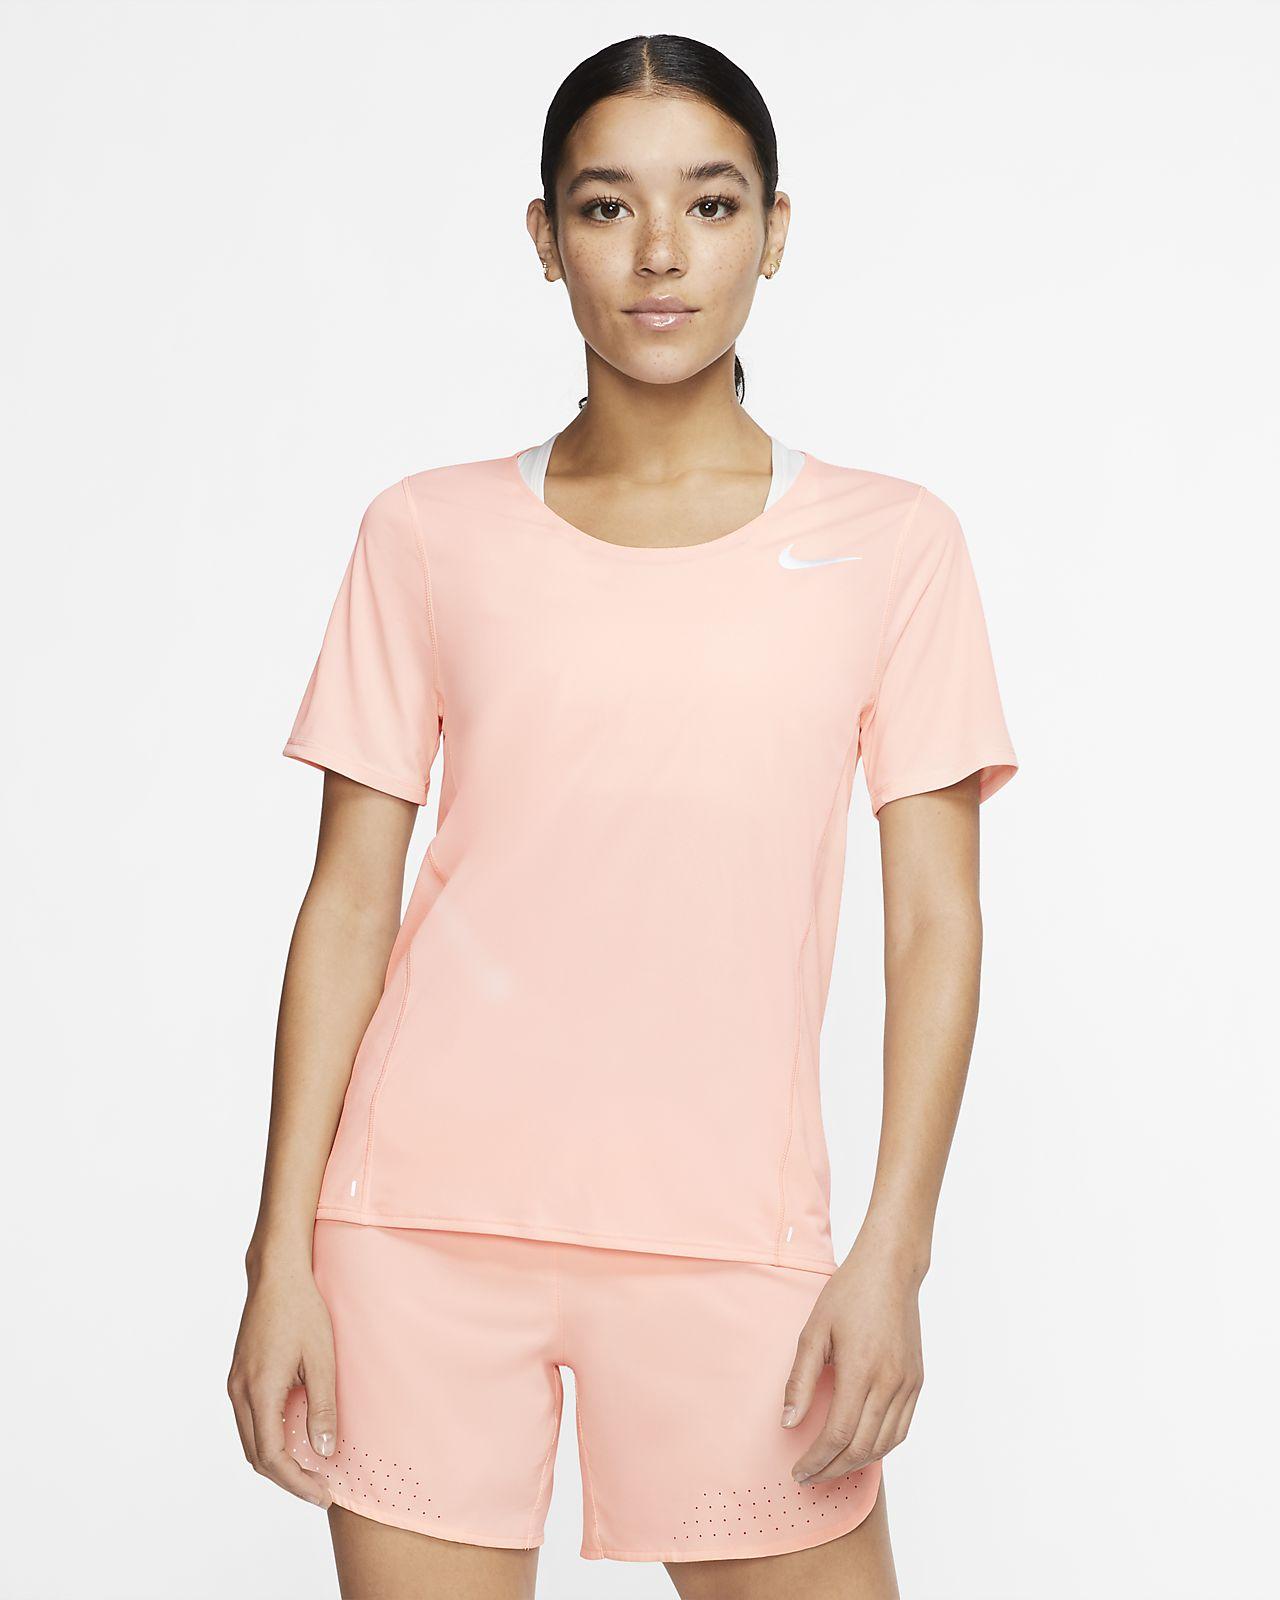 Nike City Sleek Kurzarm-Laufoberteil für Damen